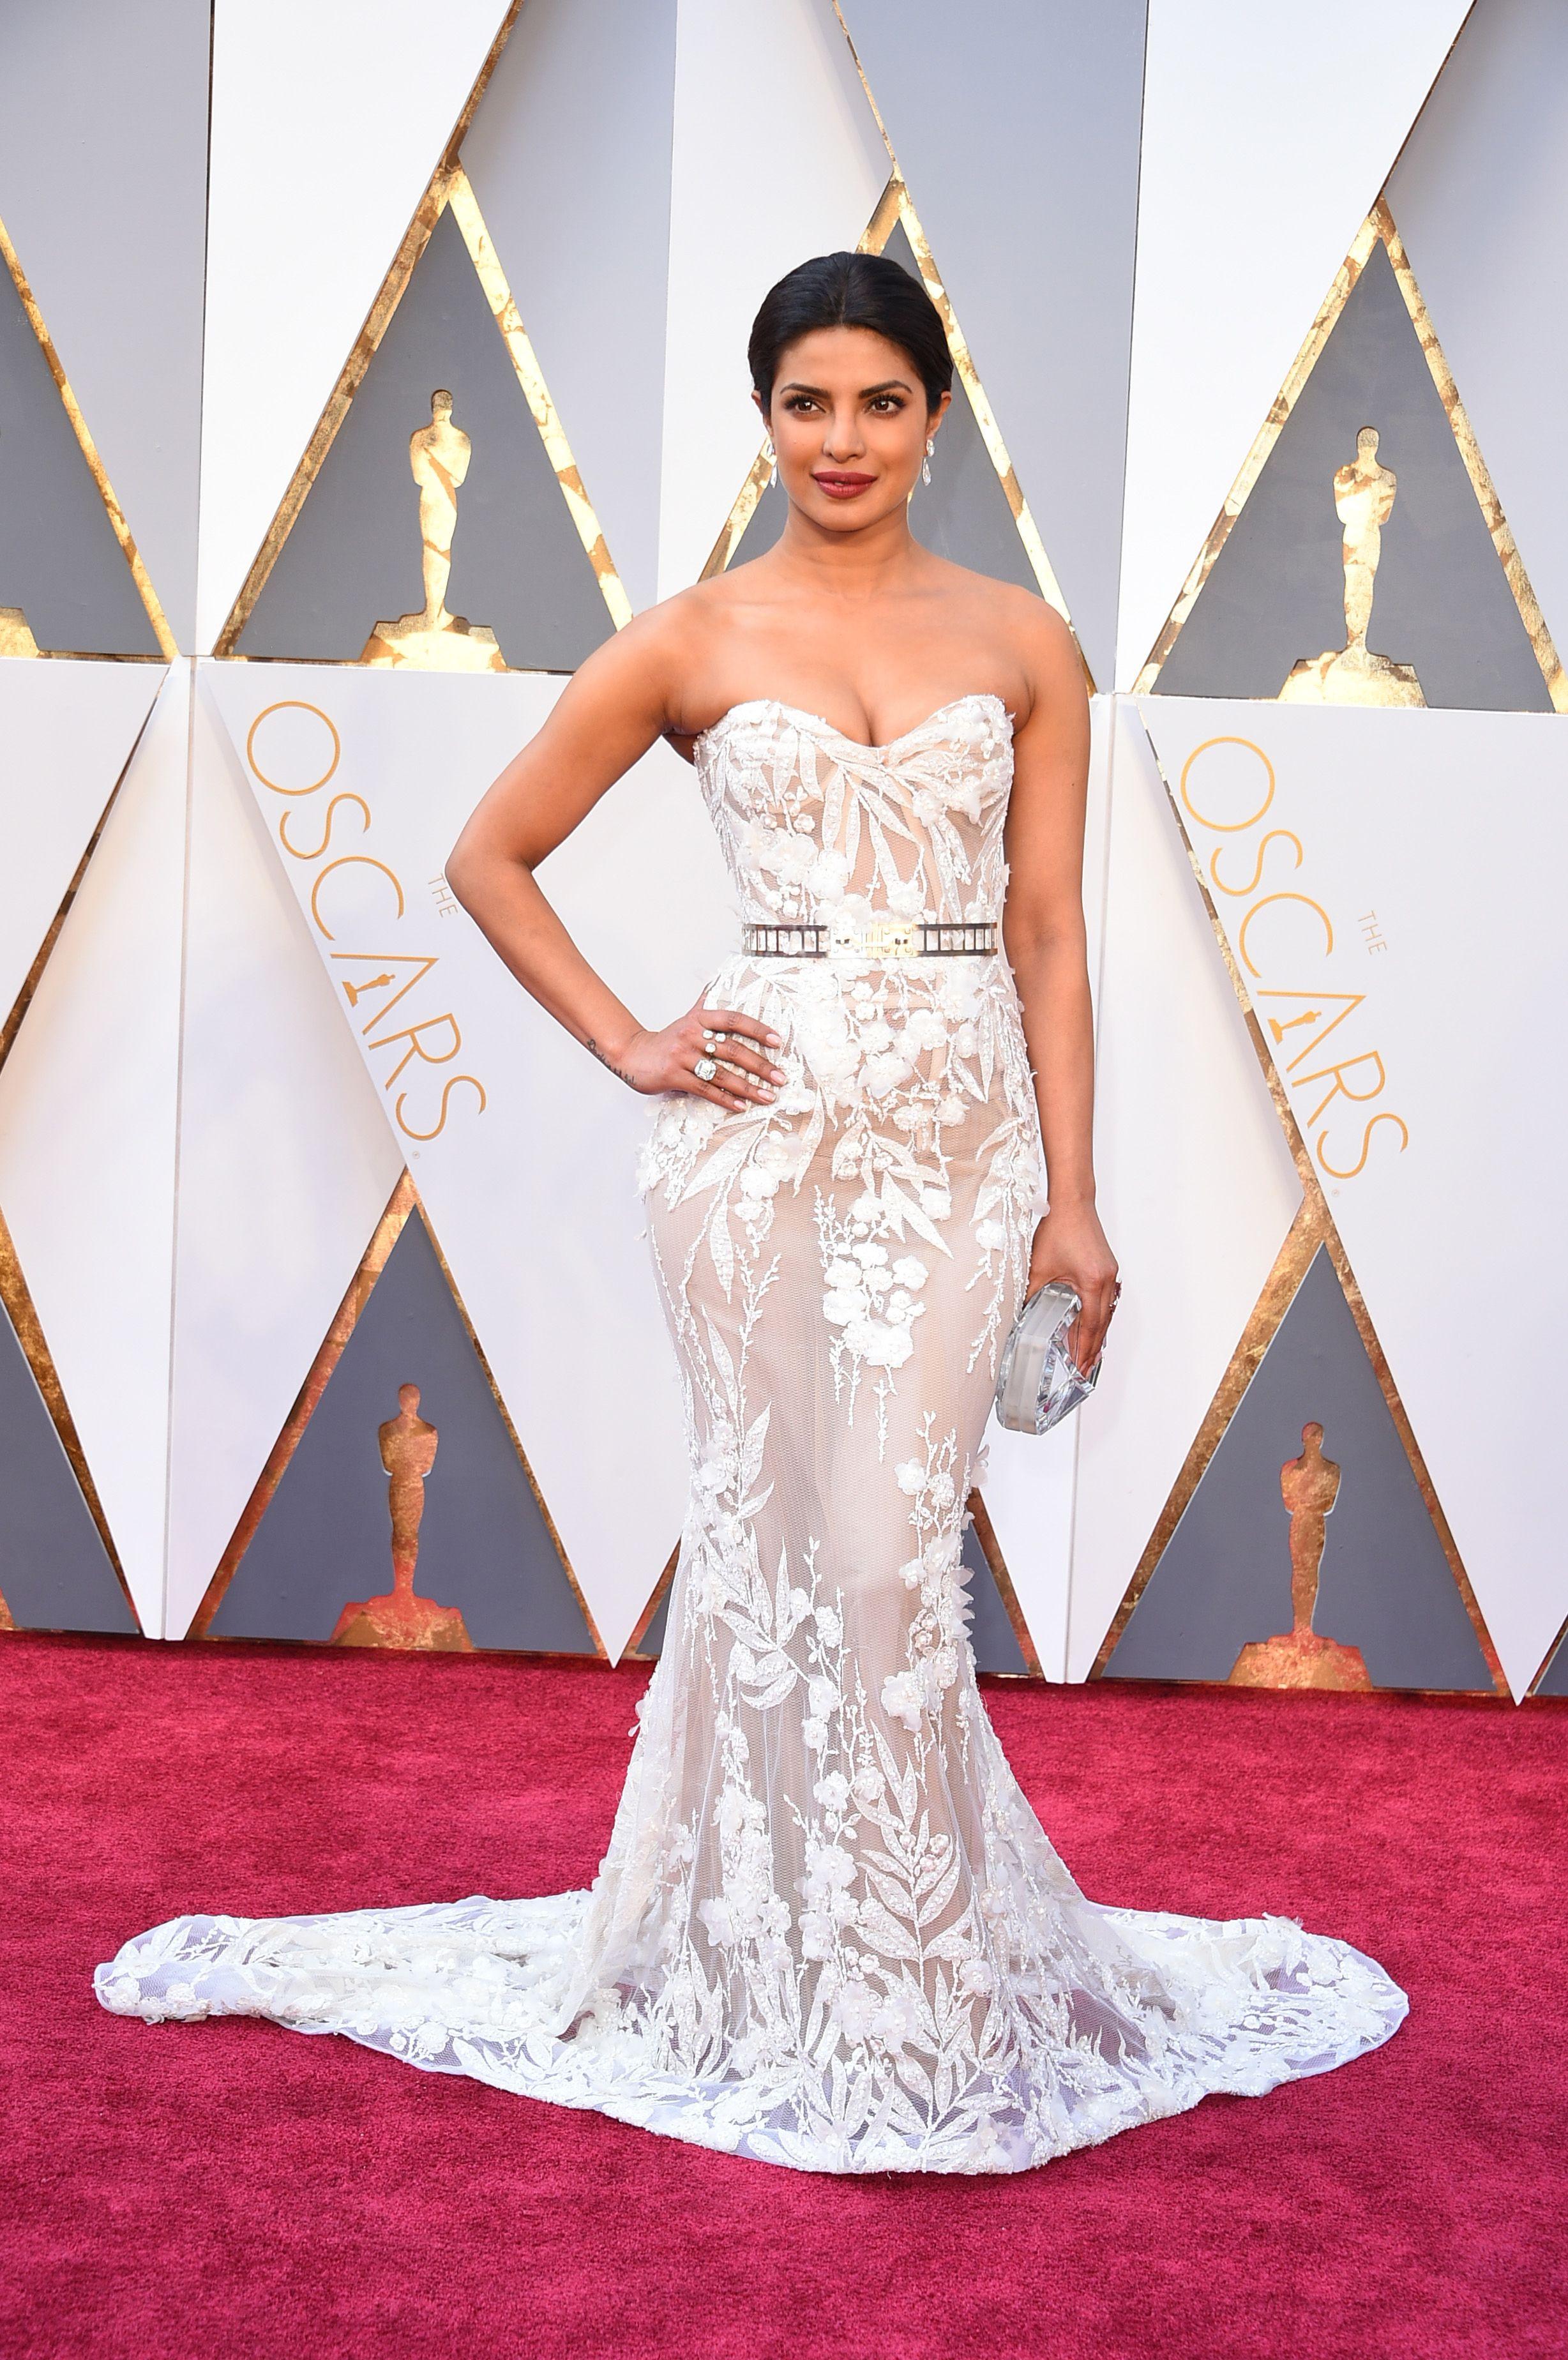 Priyanka Chopra\'s Oscars Look Is the Perfect Mix of Elegance and ...